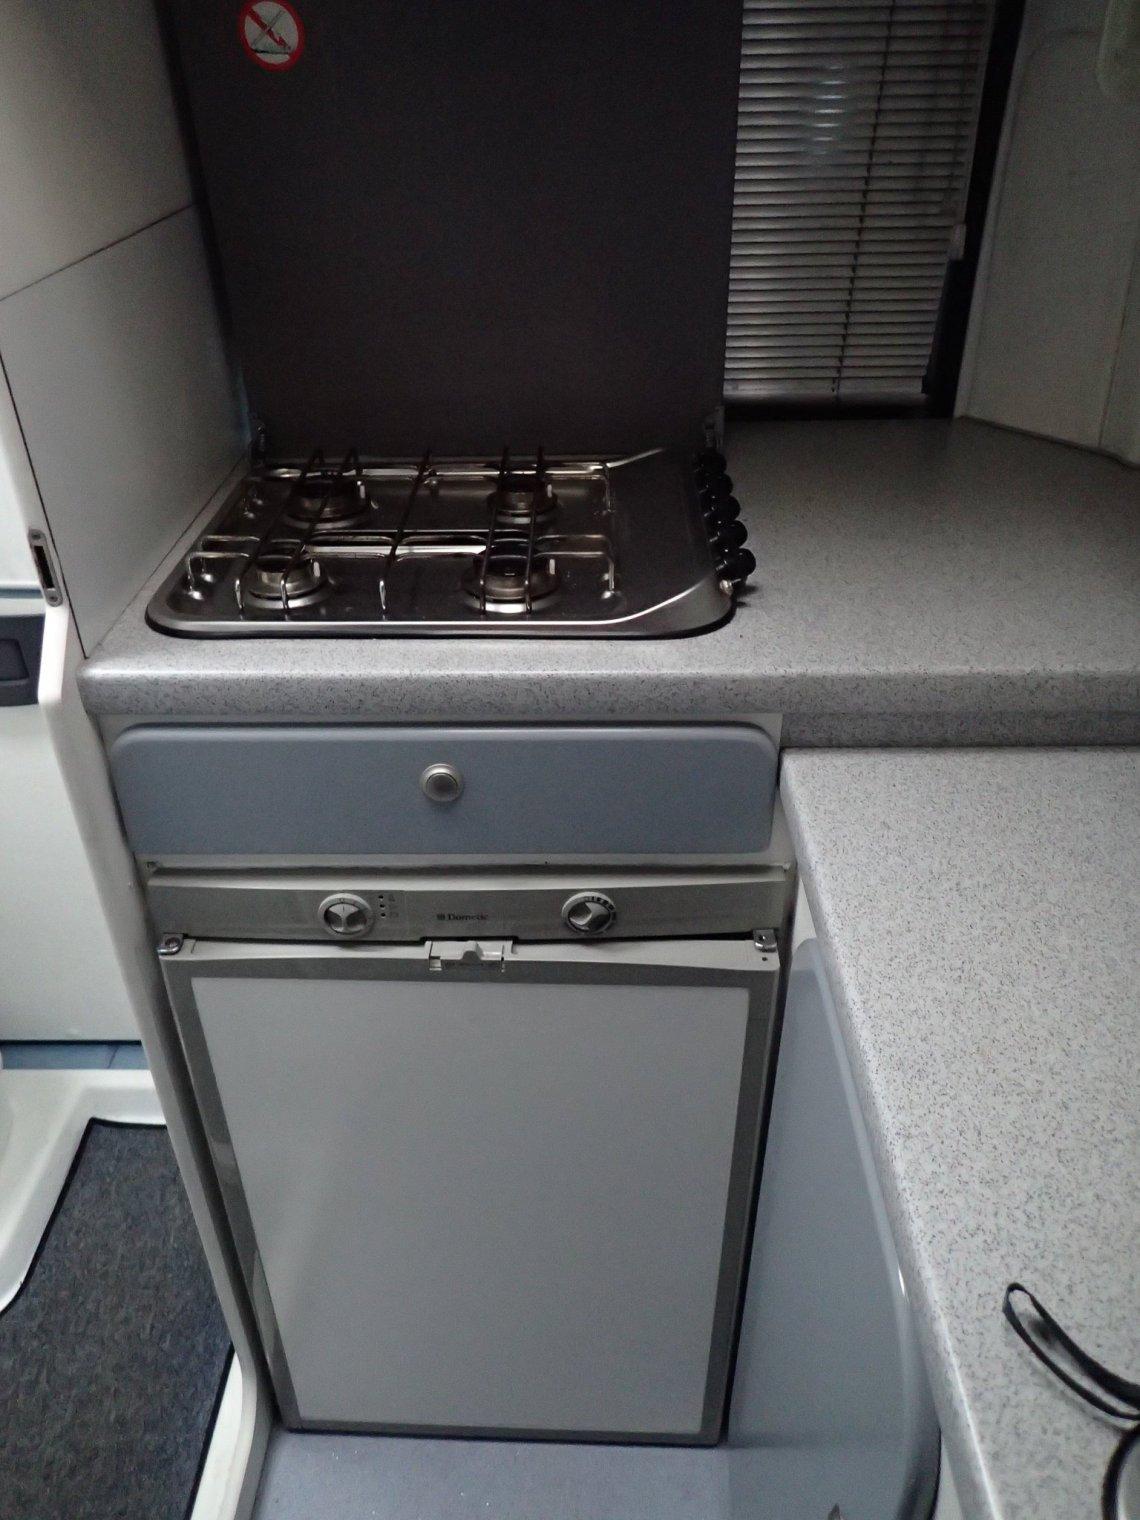 Dometic fridge, Grill and 4 burner hob